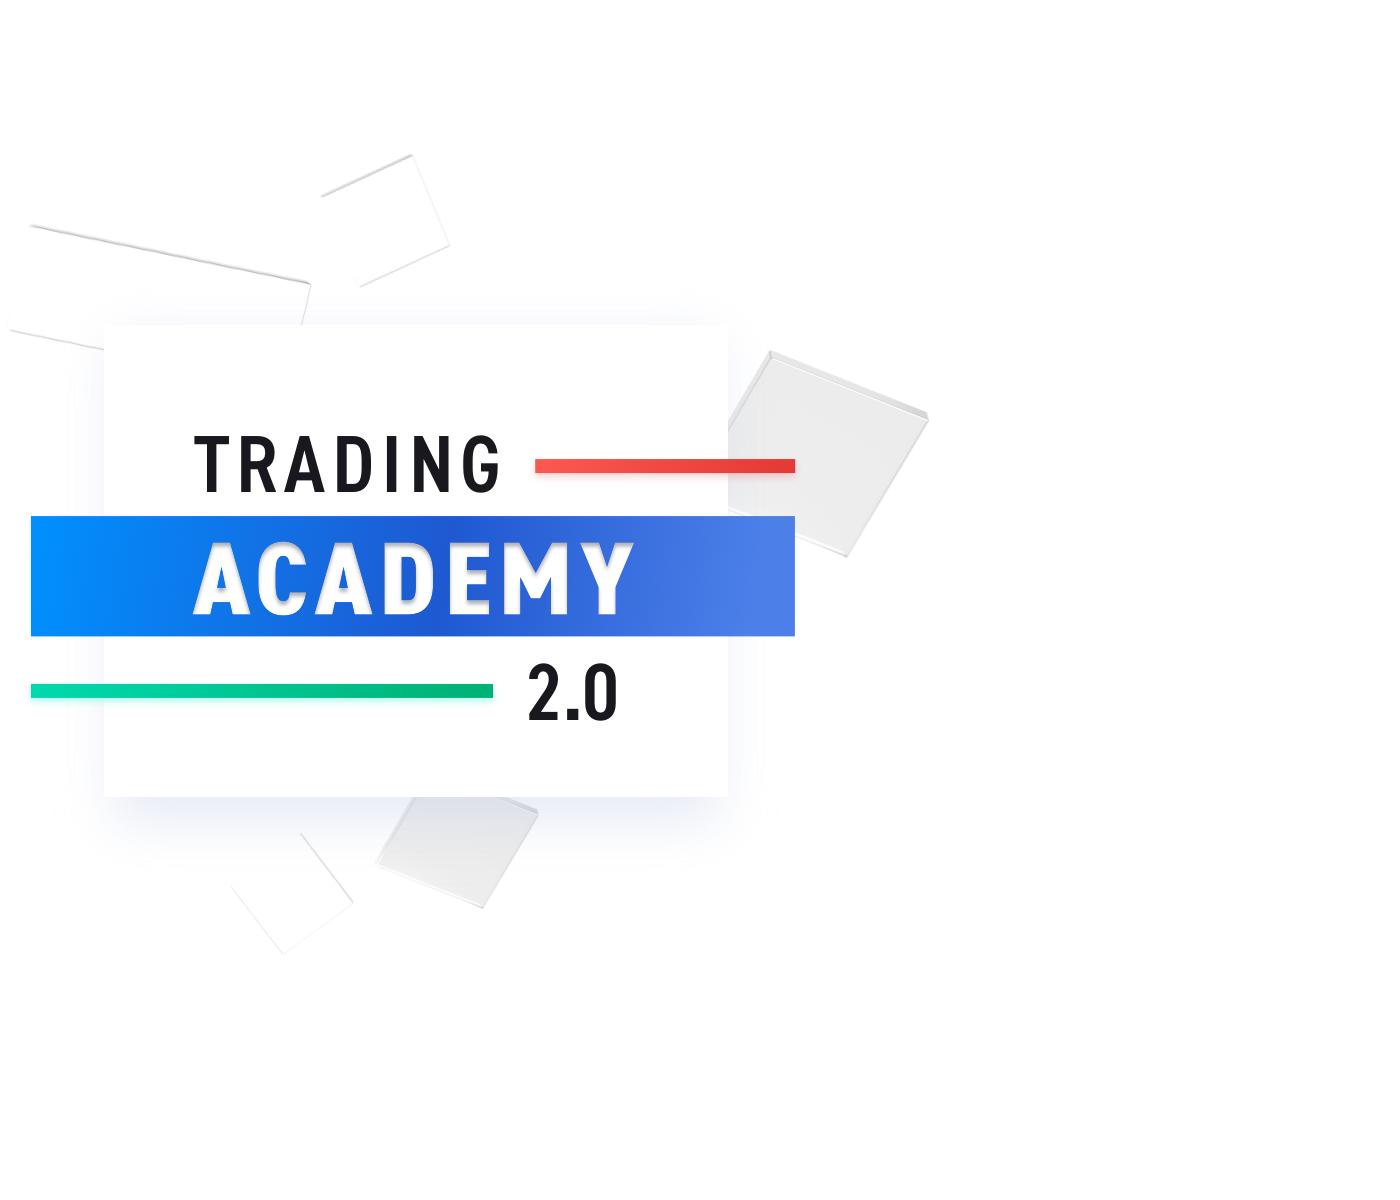 Trading Academy_KV@2x